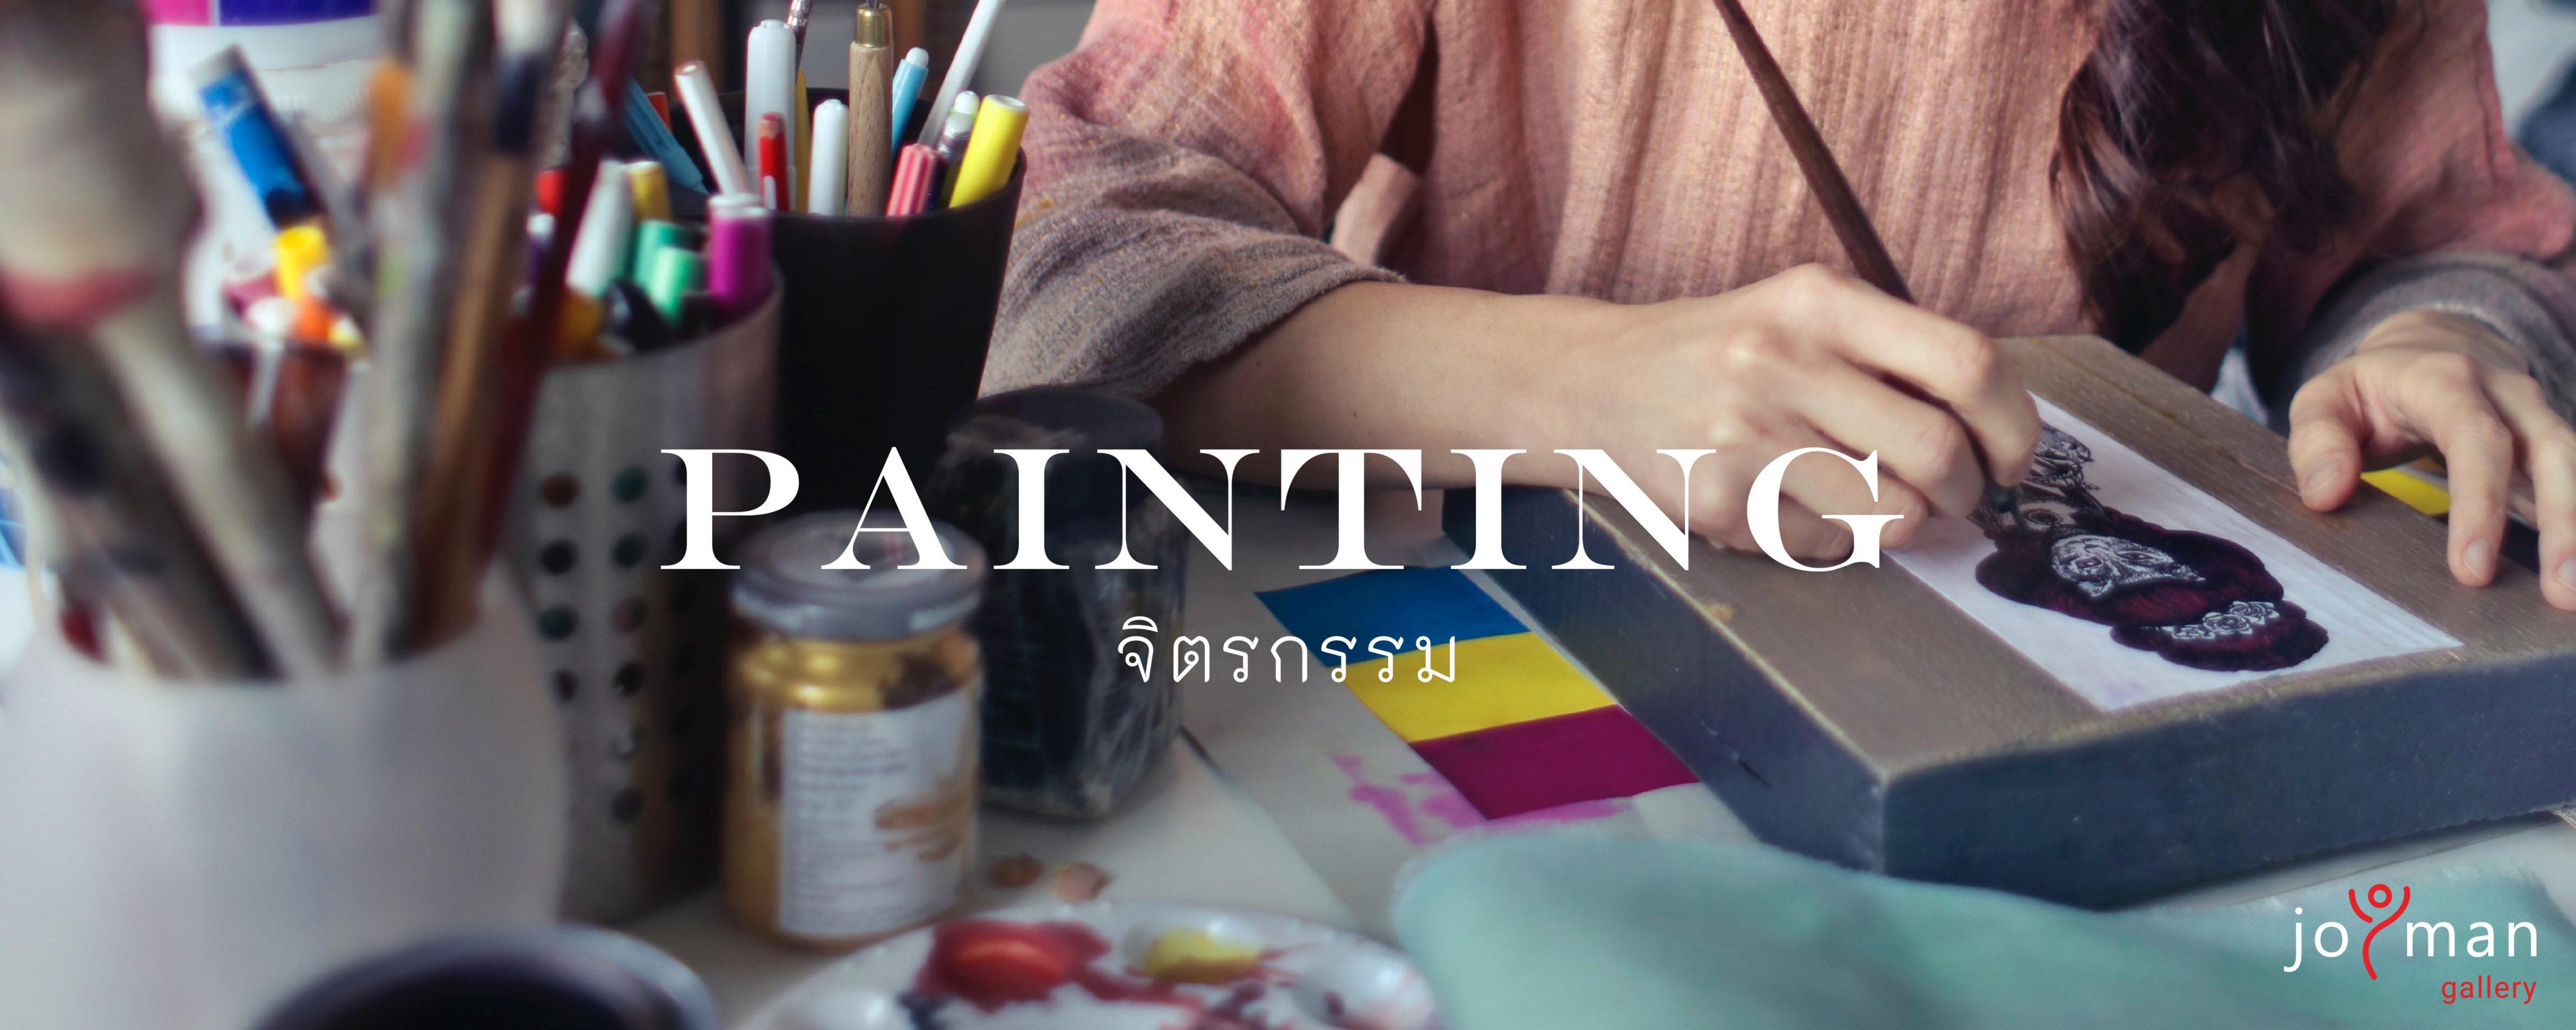 Painting mood